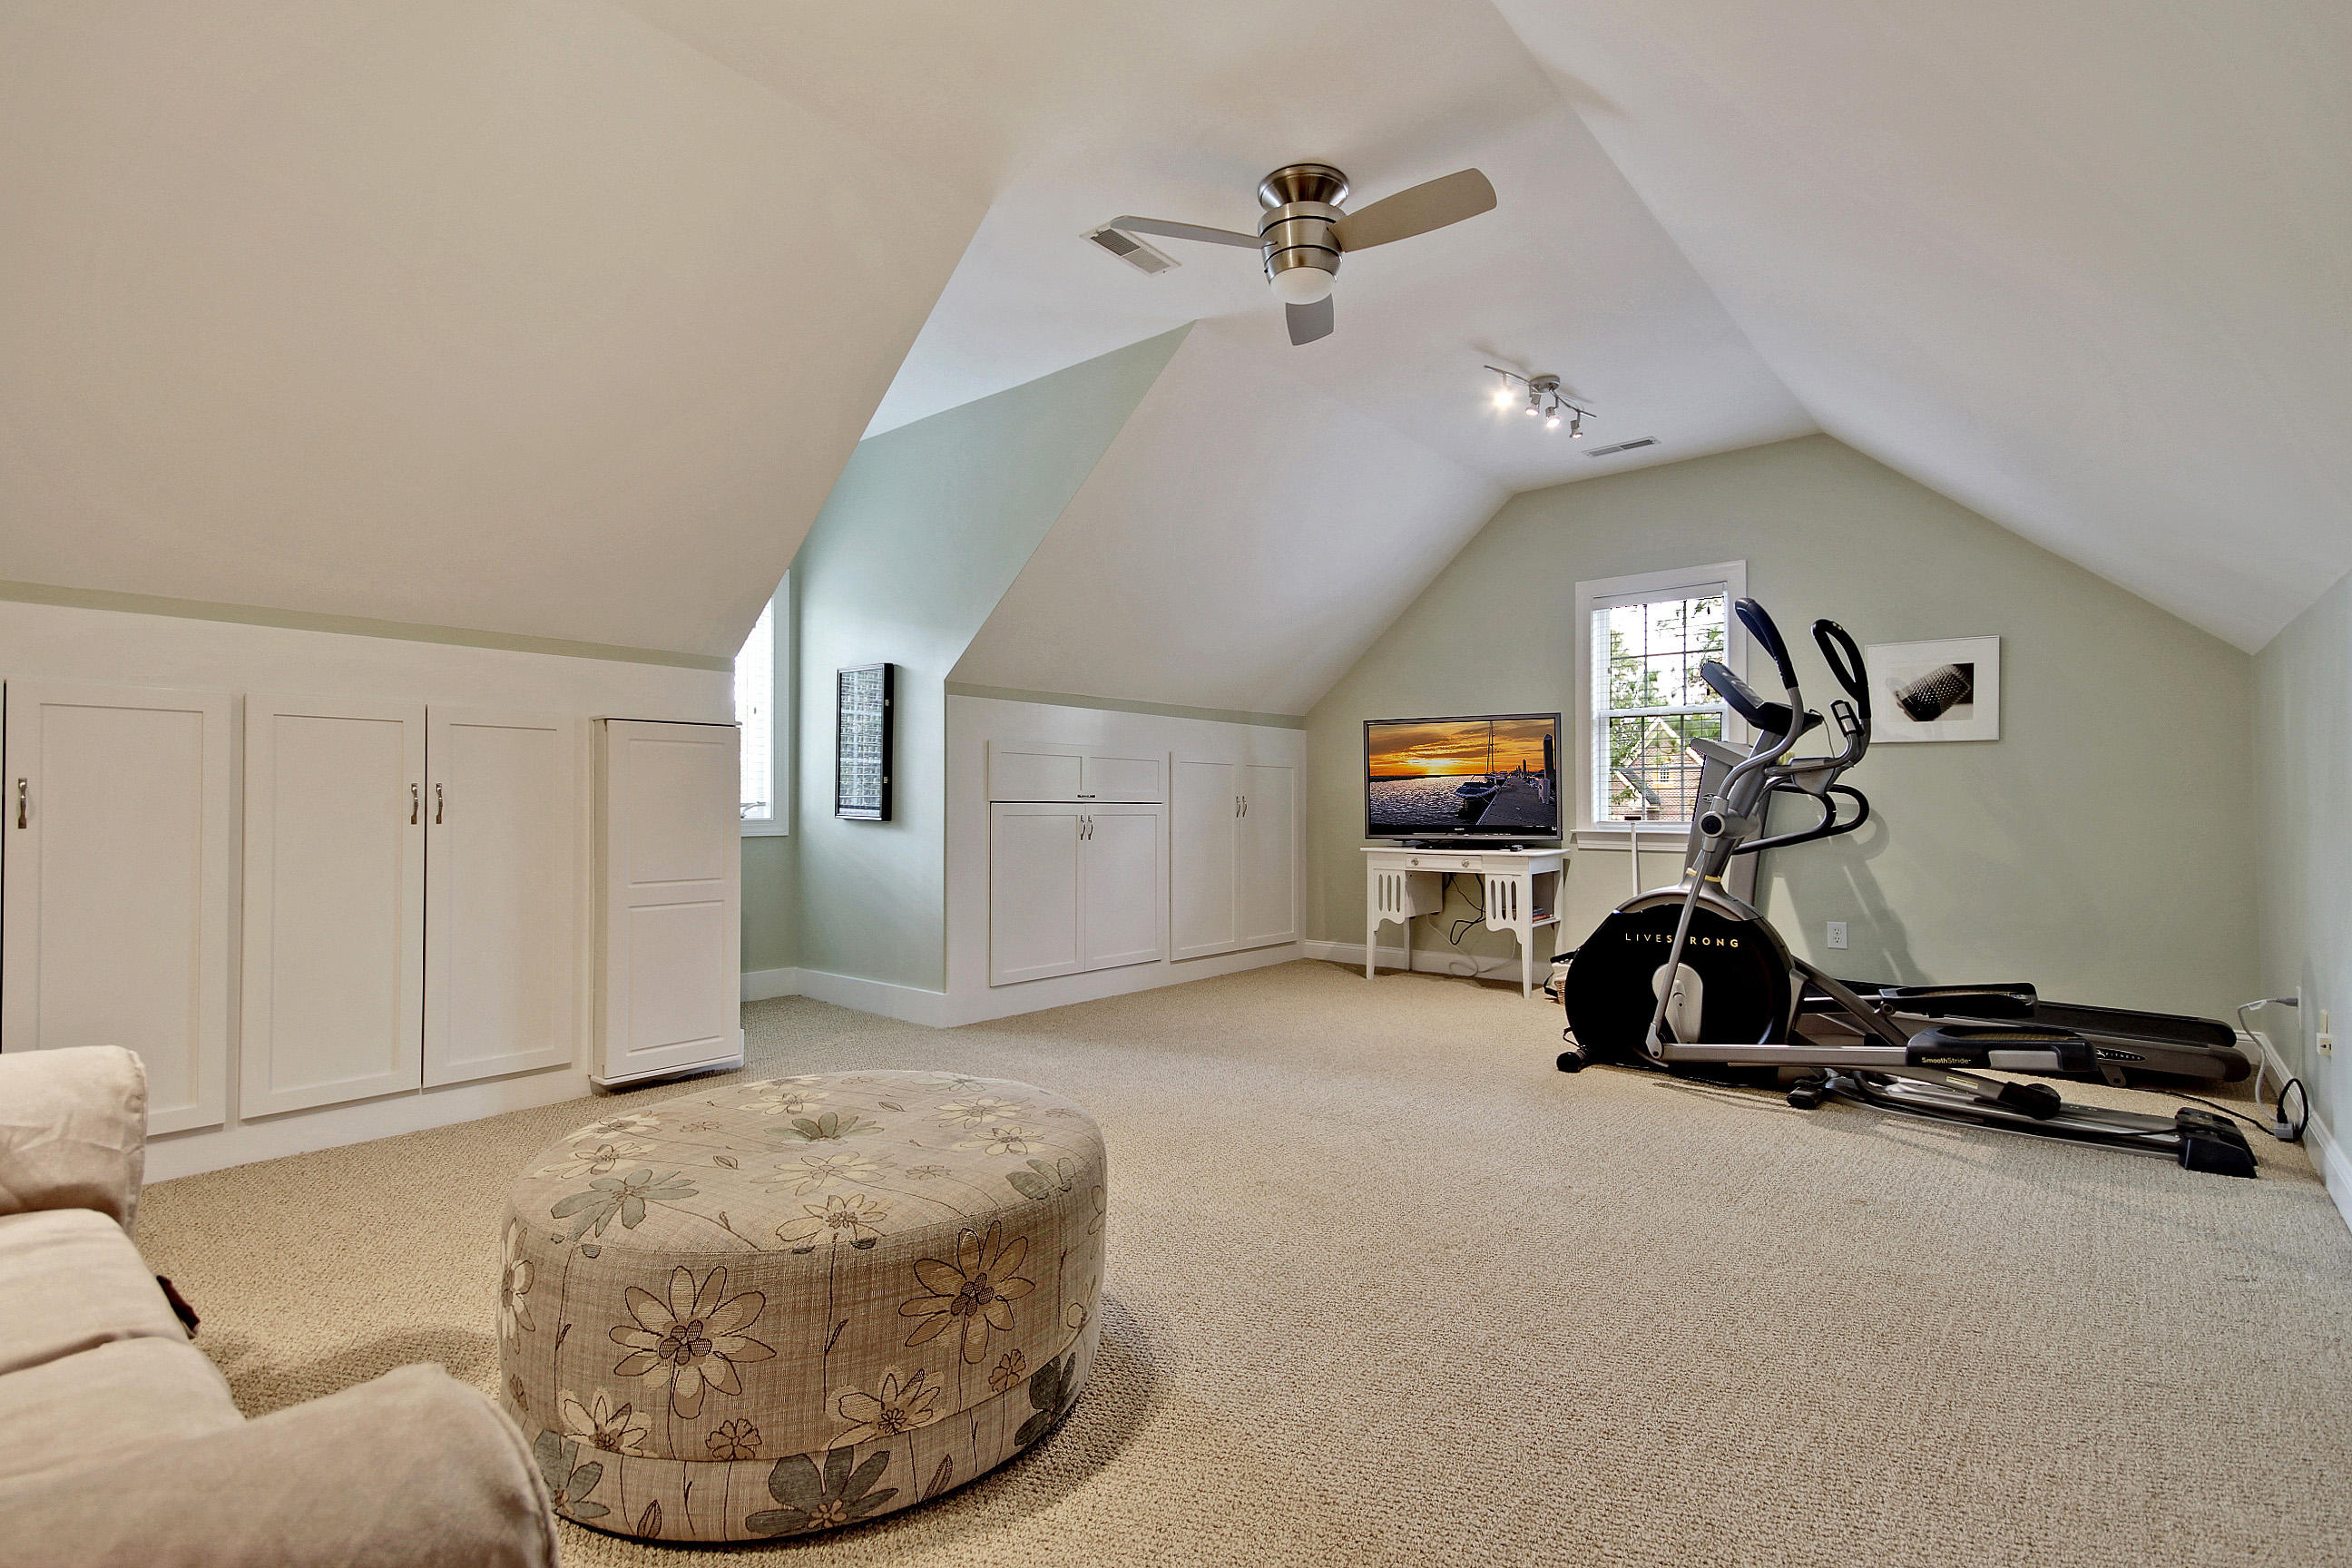 Dunes West Homes For Sale - 2364 Darts Cove, Mount Pleasant, SC - 7